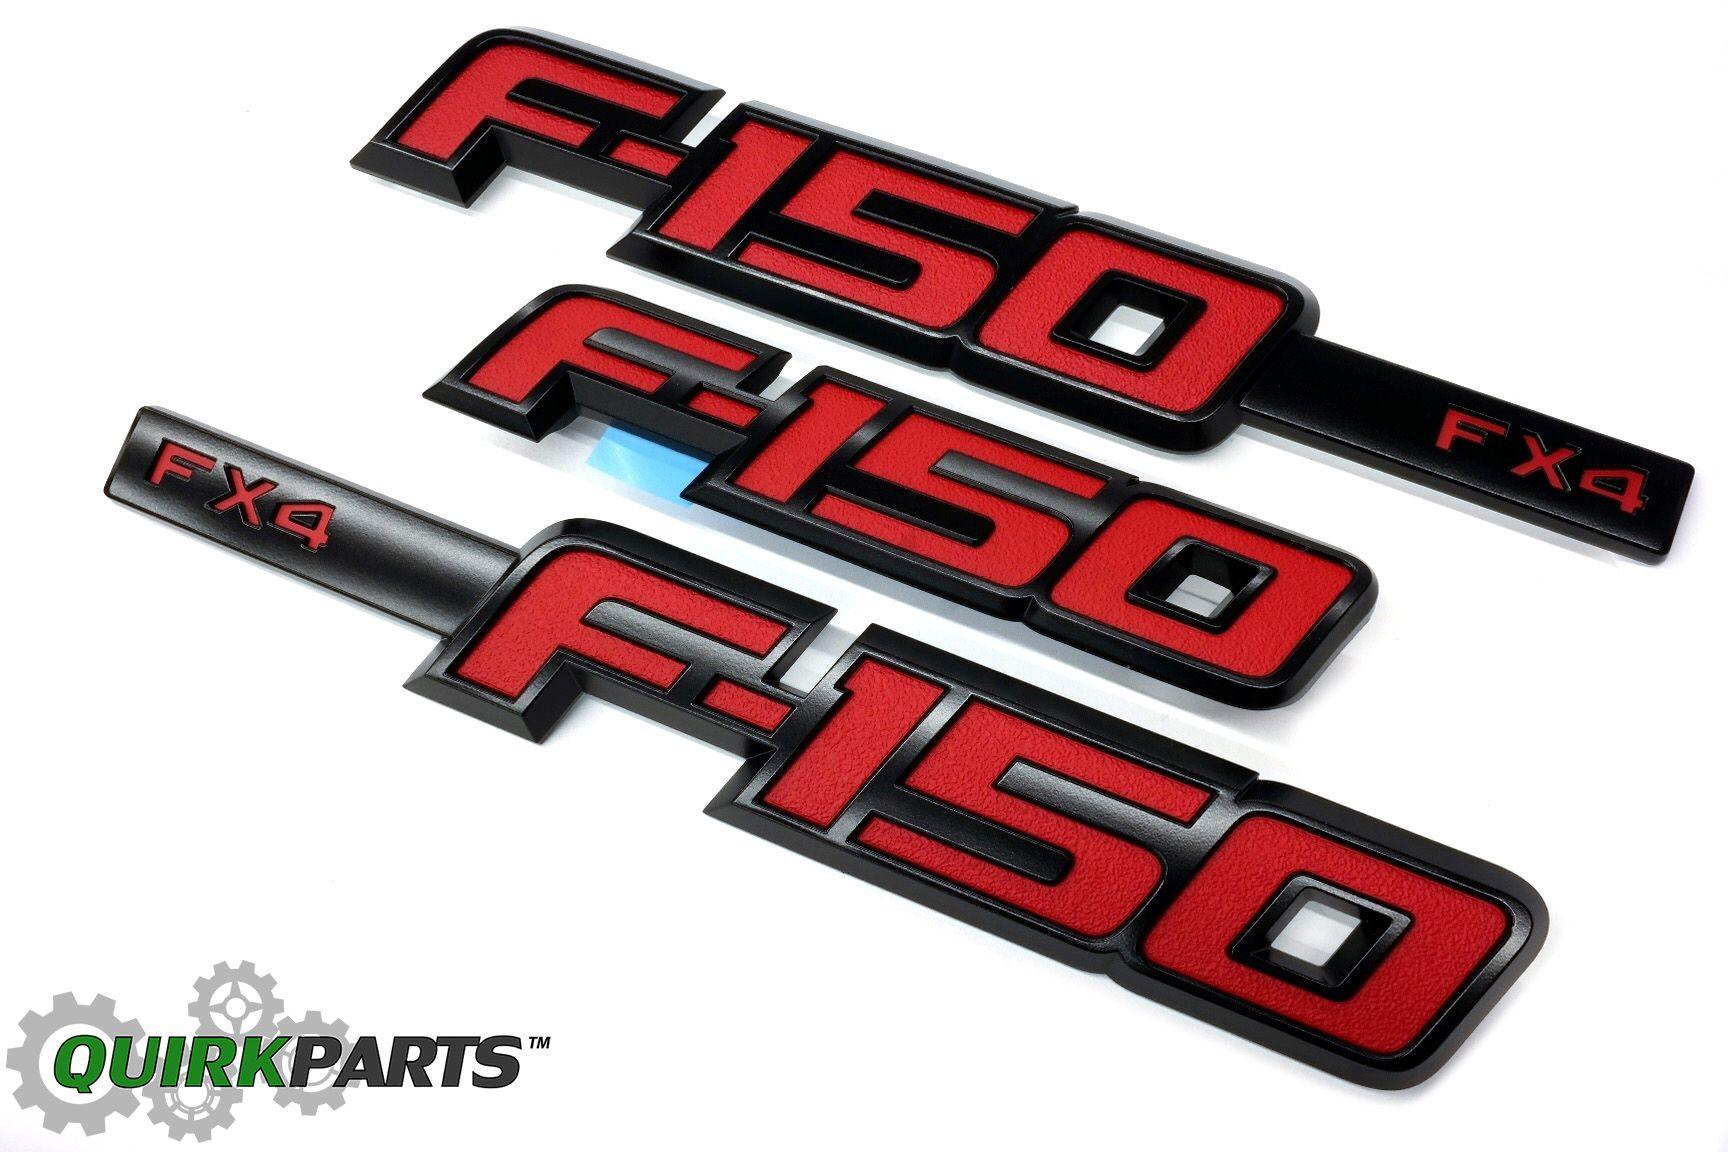 2009-2014 Ford F-150 FX4 Black /& Red Fender Emblem 2 Piece Sport Kit OEM NEW